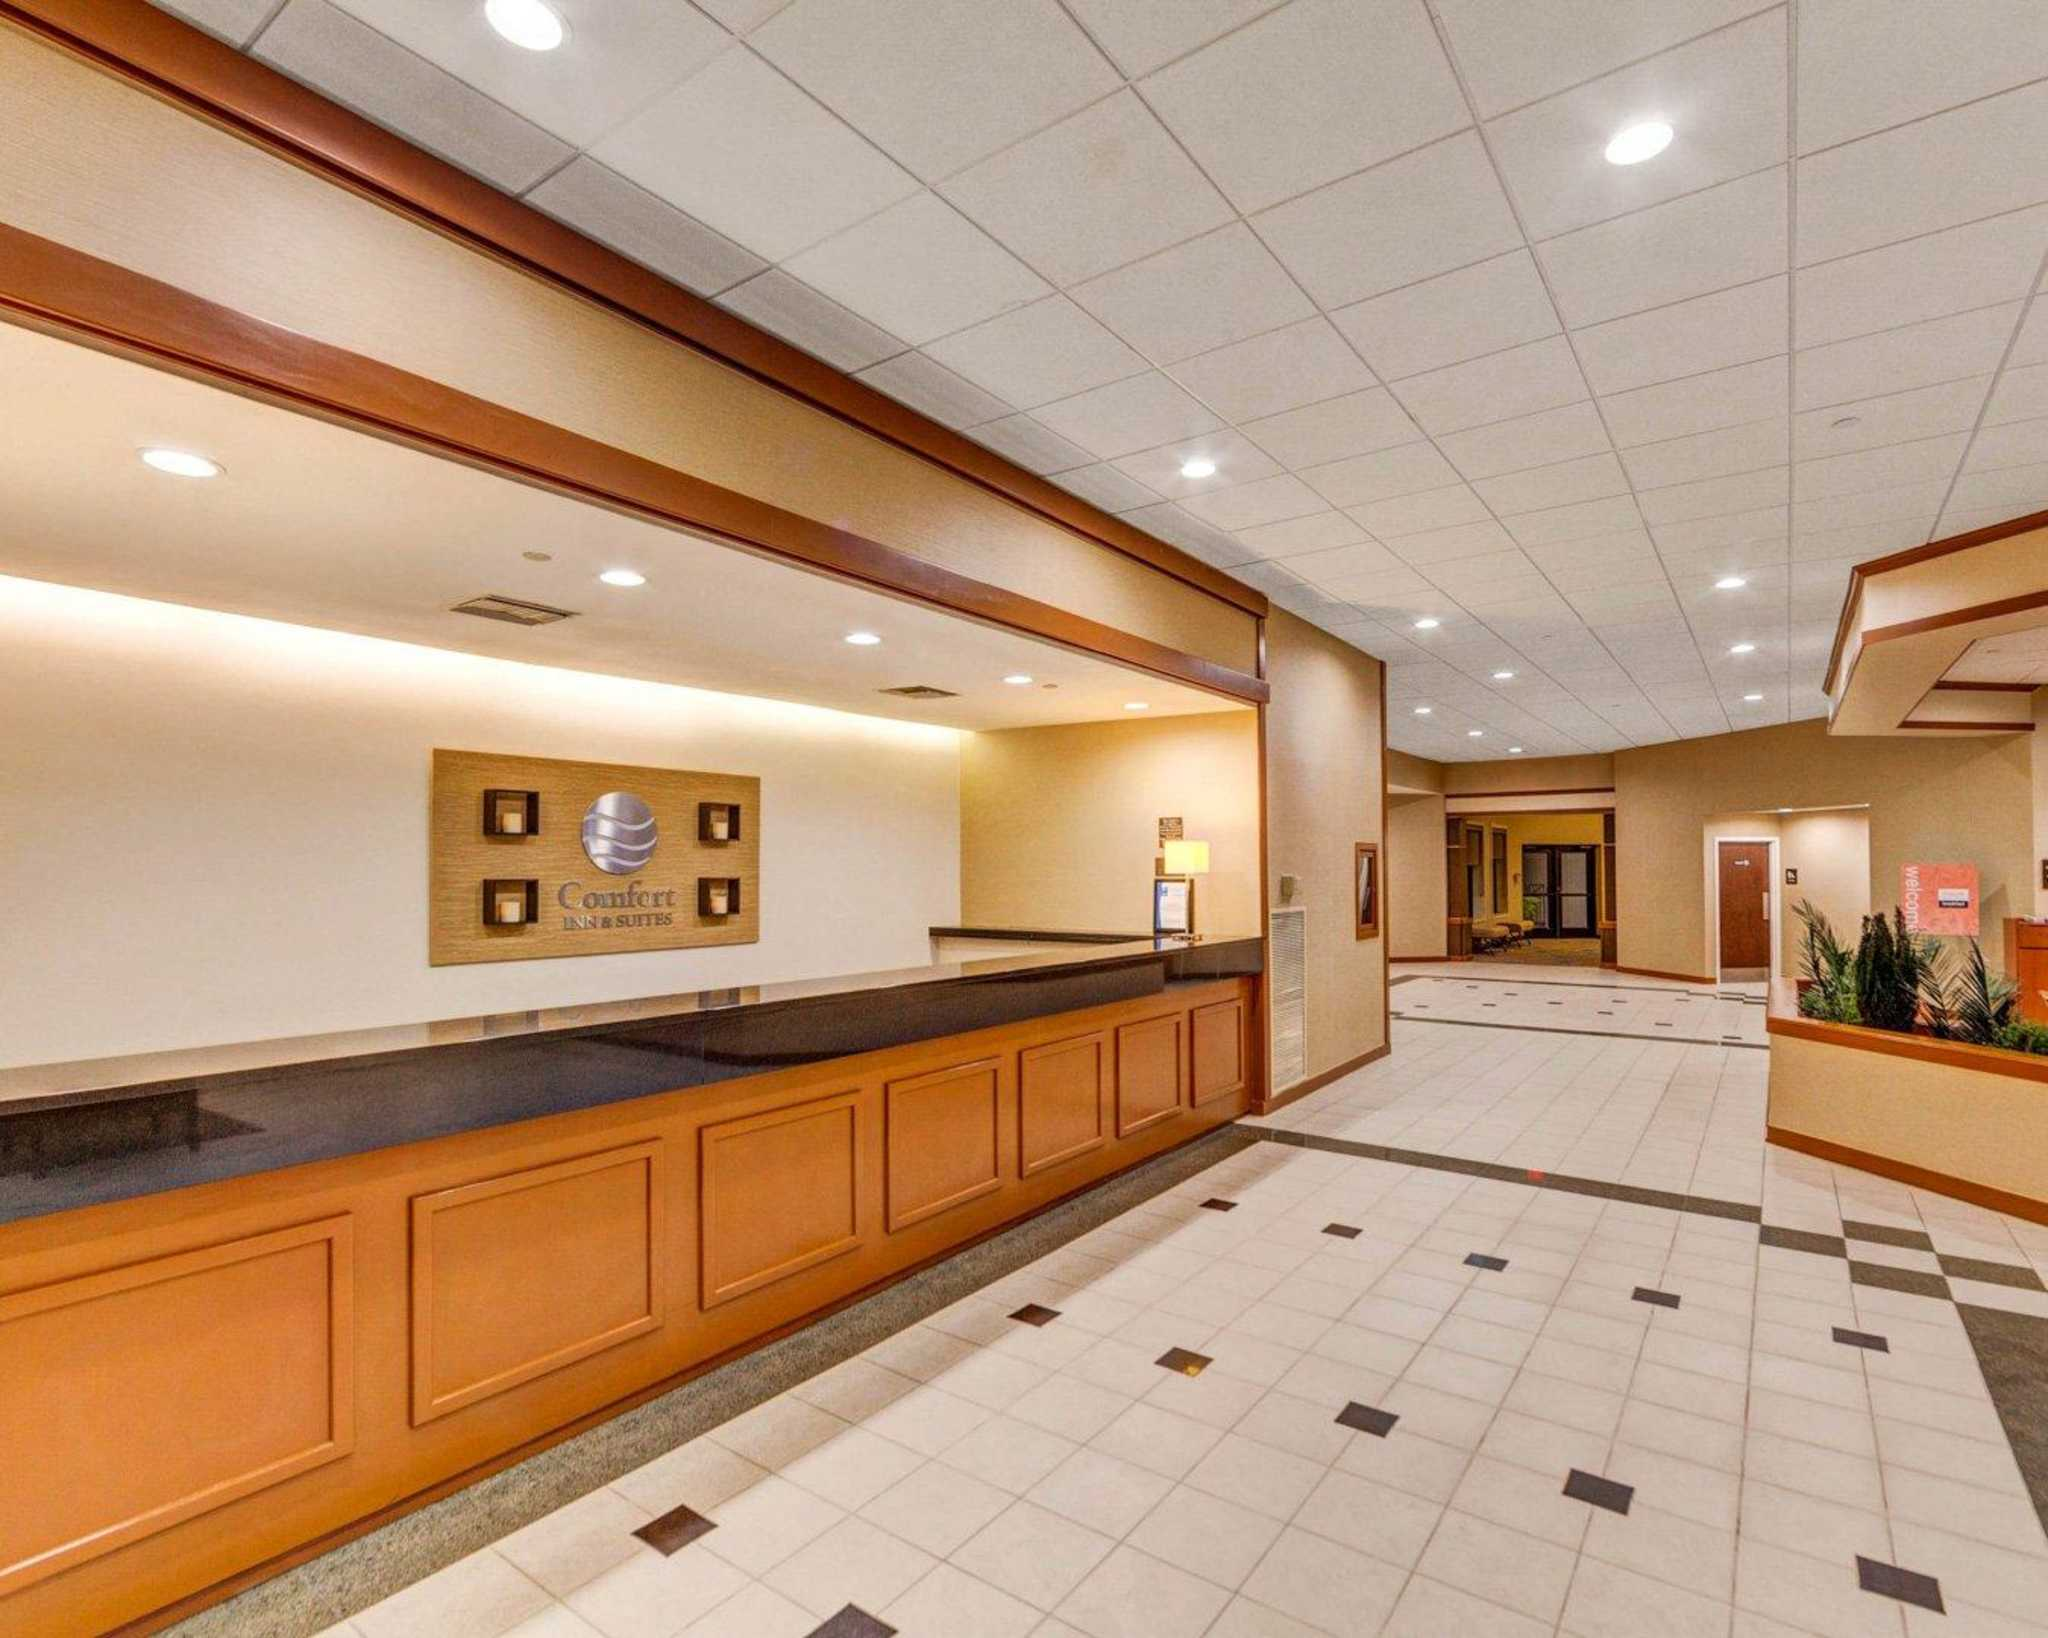 Comfort Inn & Suites Plano East image 15